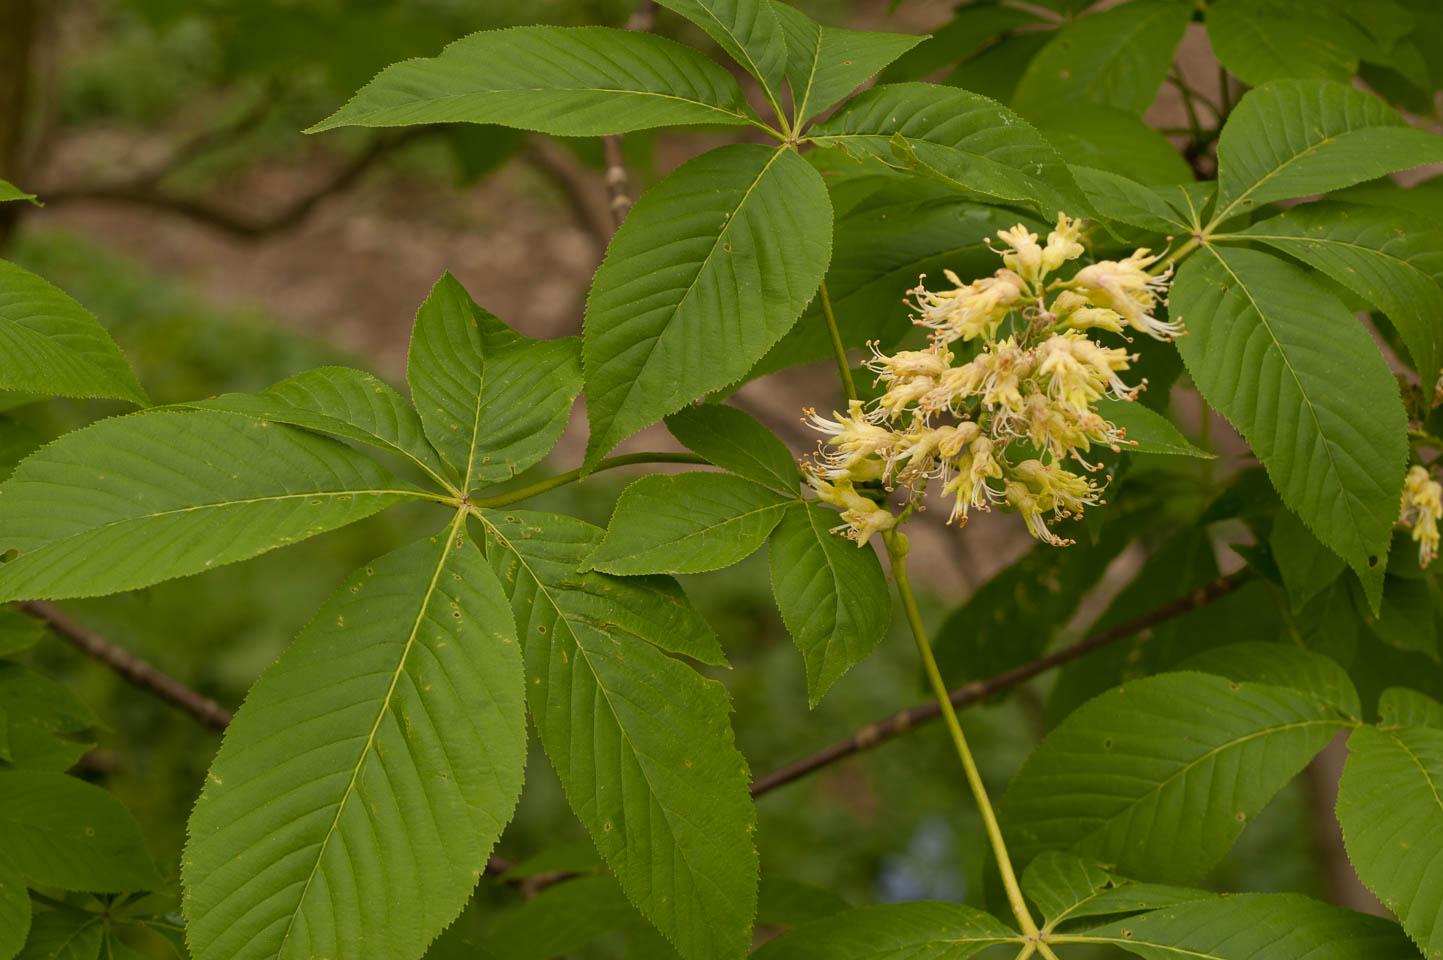 Flower and leaves of the Ohio Buckeye